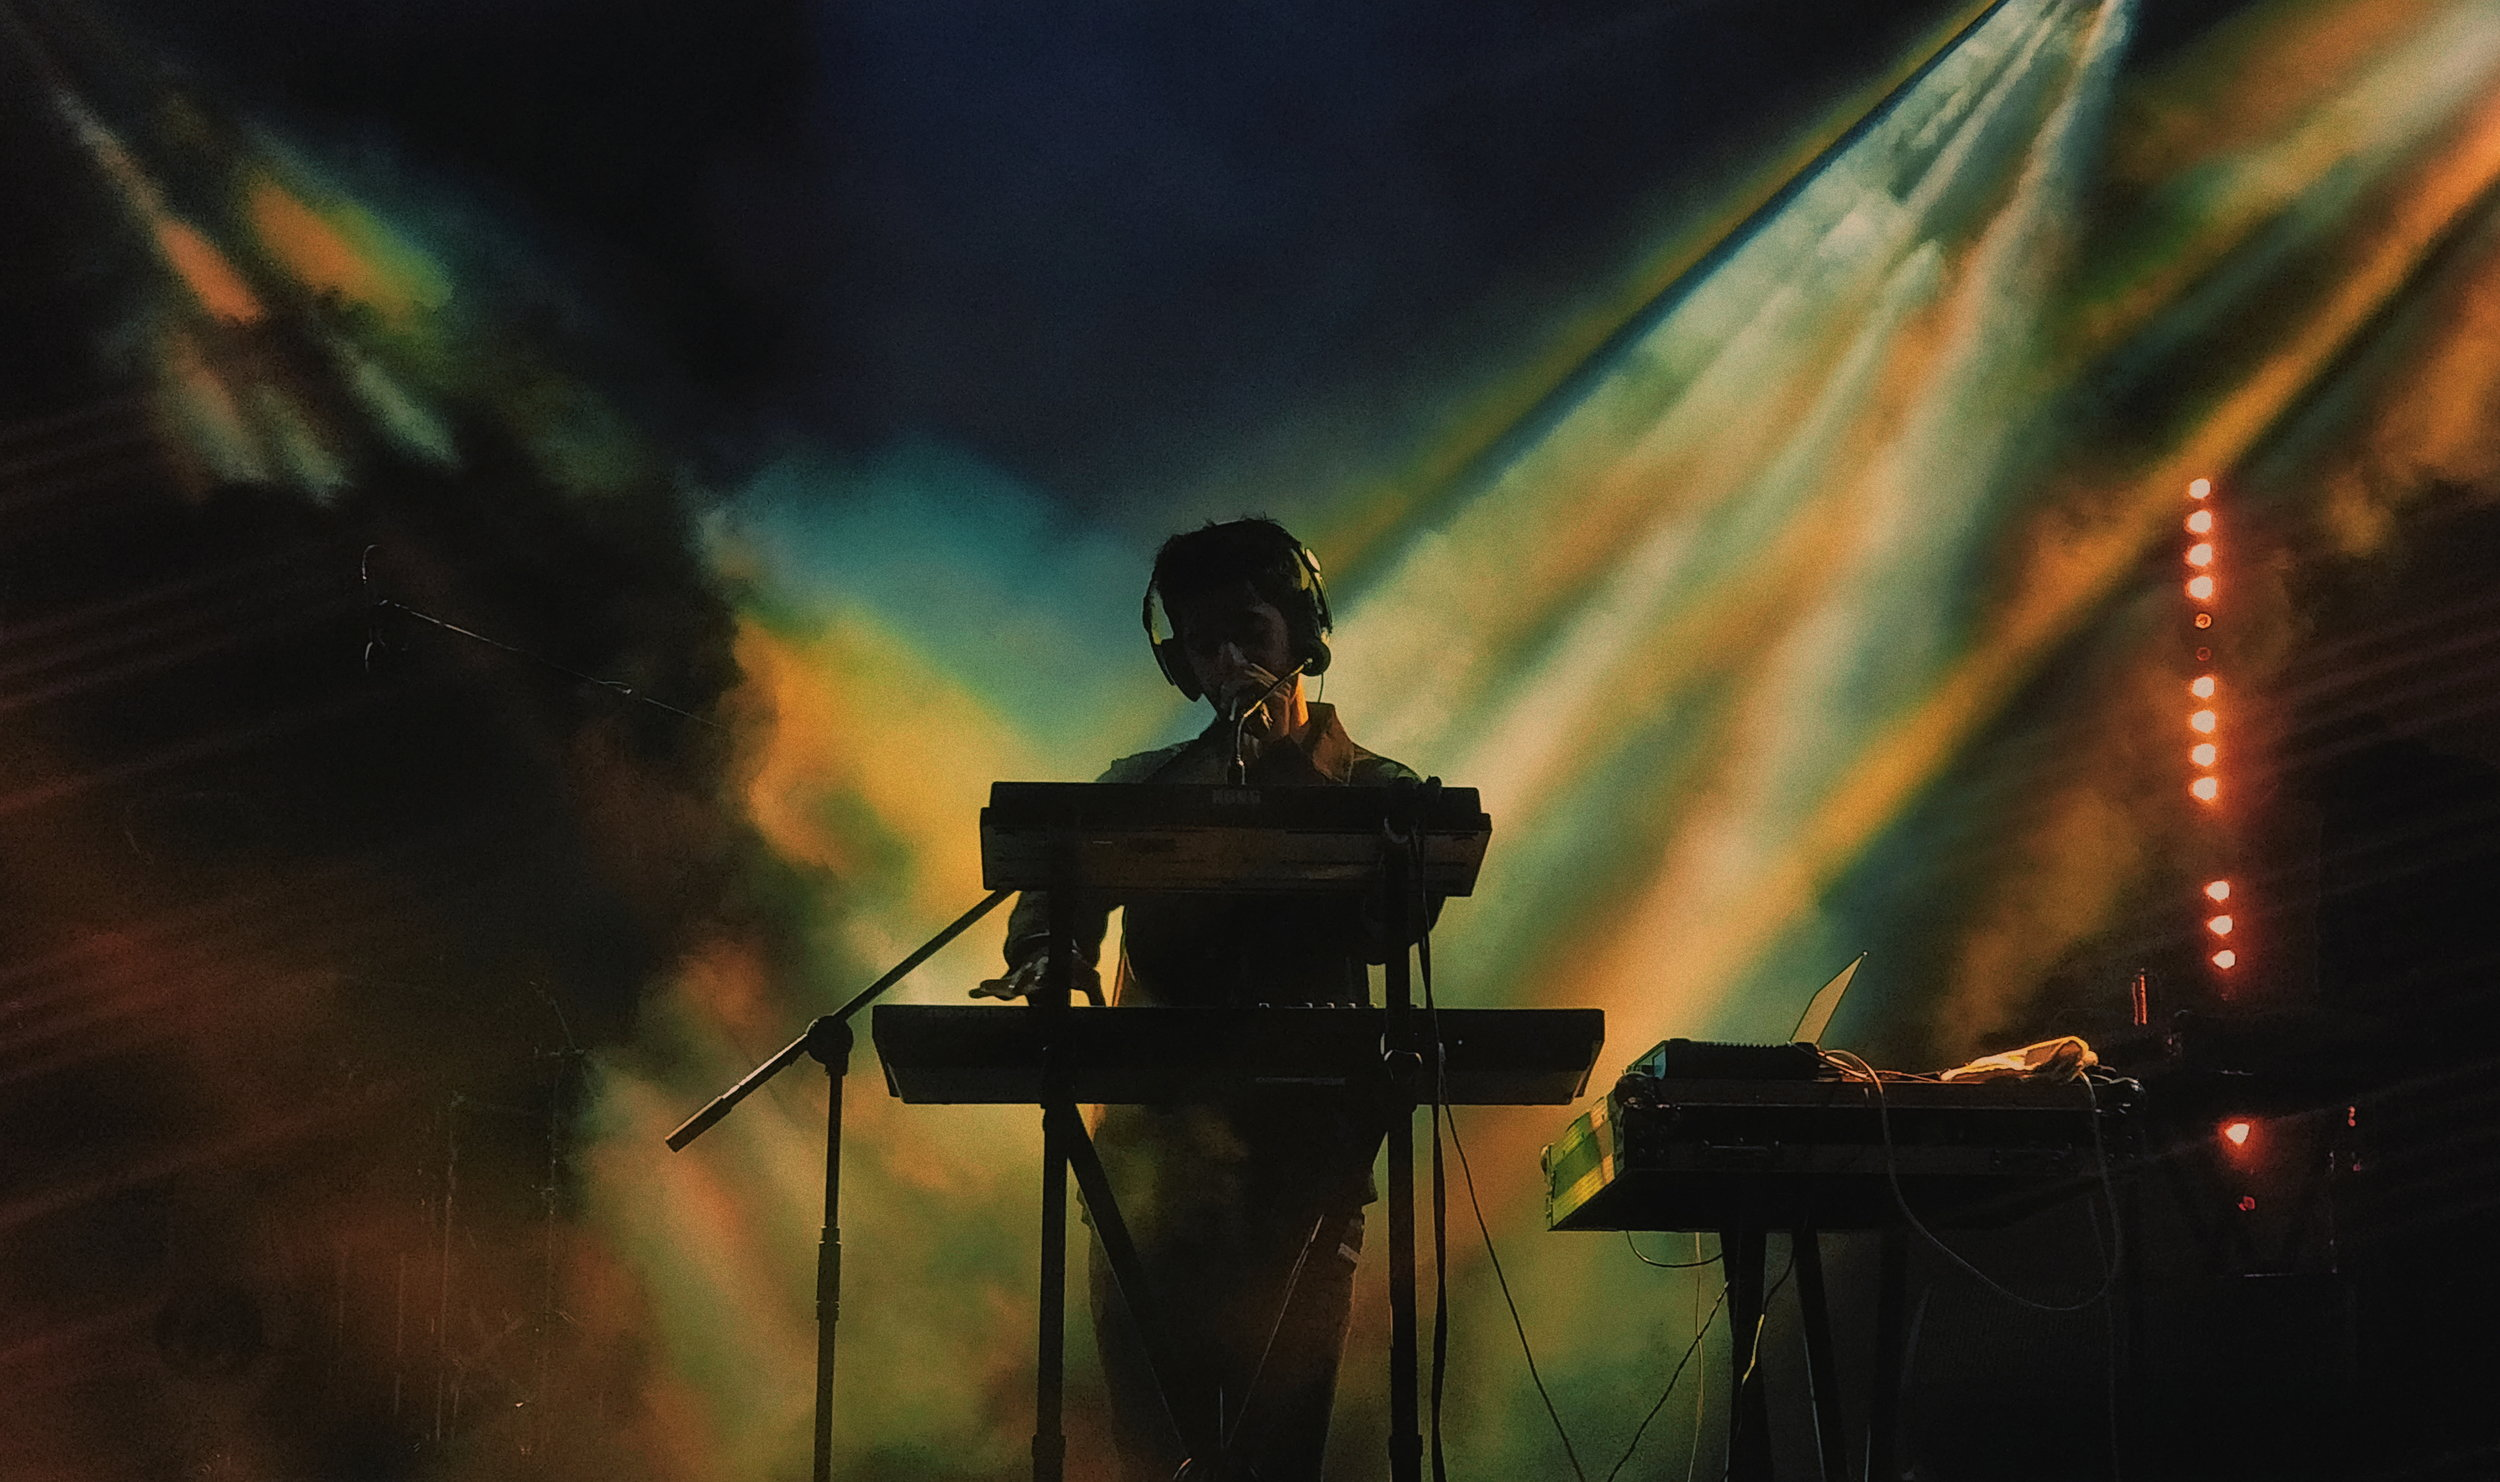 live-music-greenlake-oktoberfest.jpg